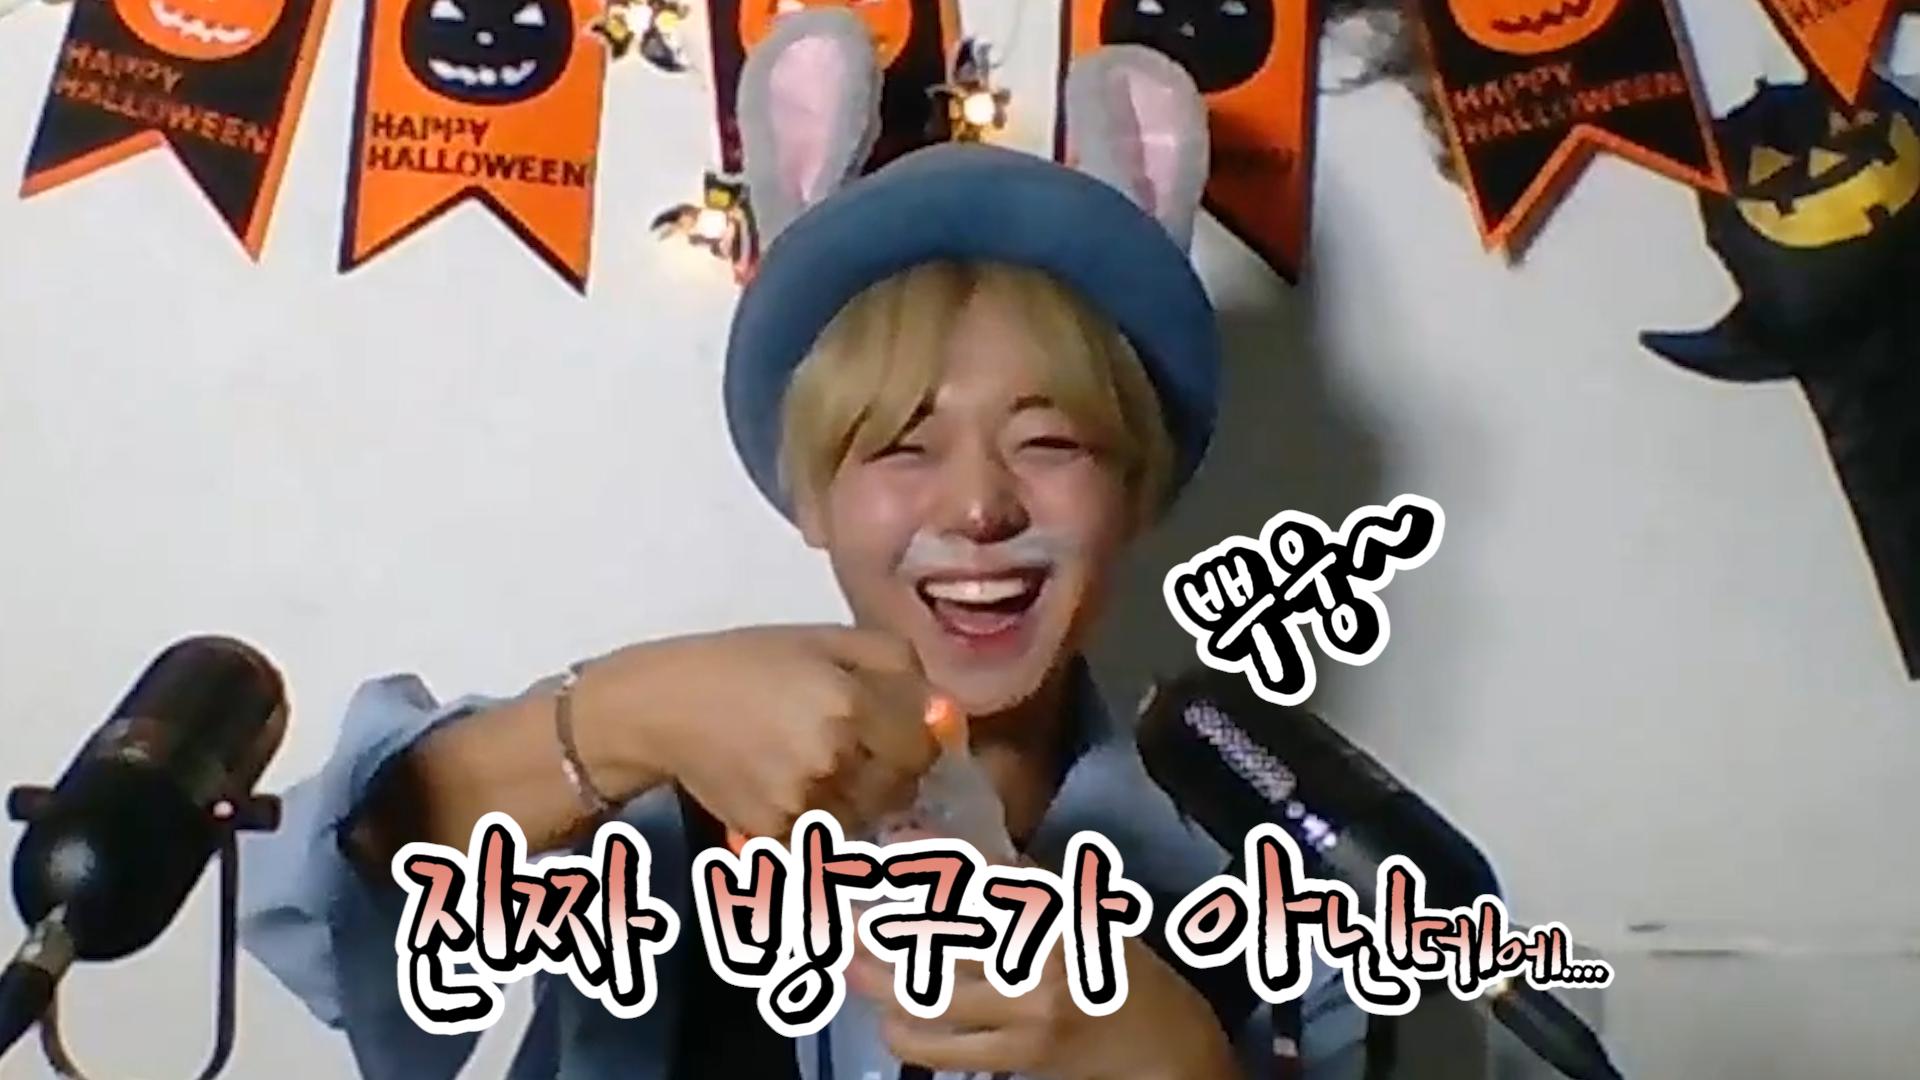 [PARK JI HOON] 🐰울 투투 깜찍함에 저 오도방구 타고 극락가요🏍💨 (JI HOON's halloween costume&ASMR)